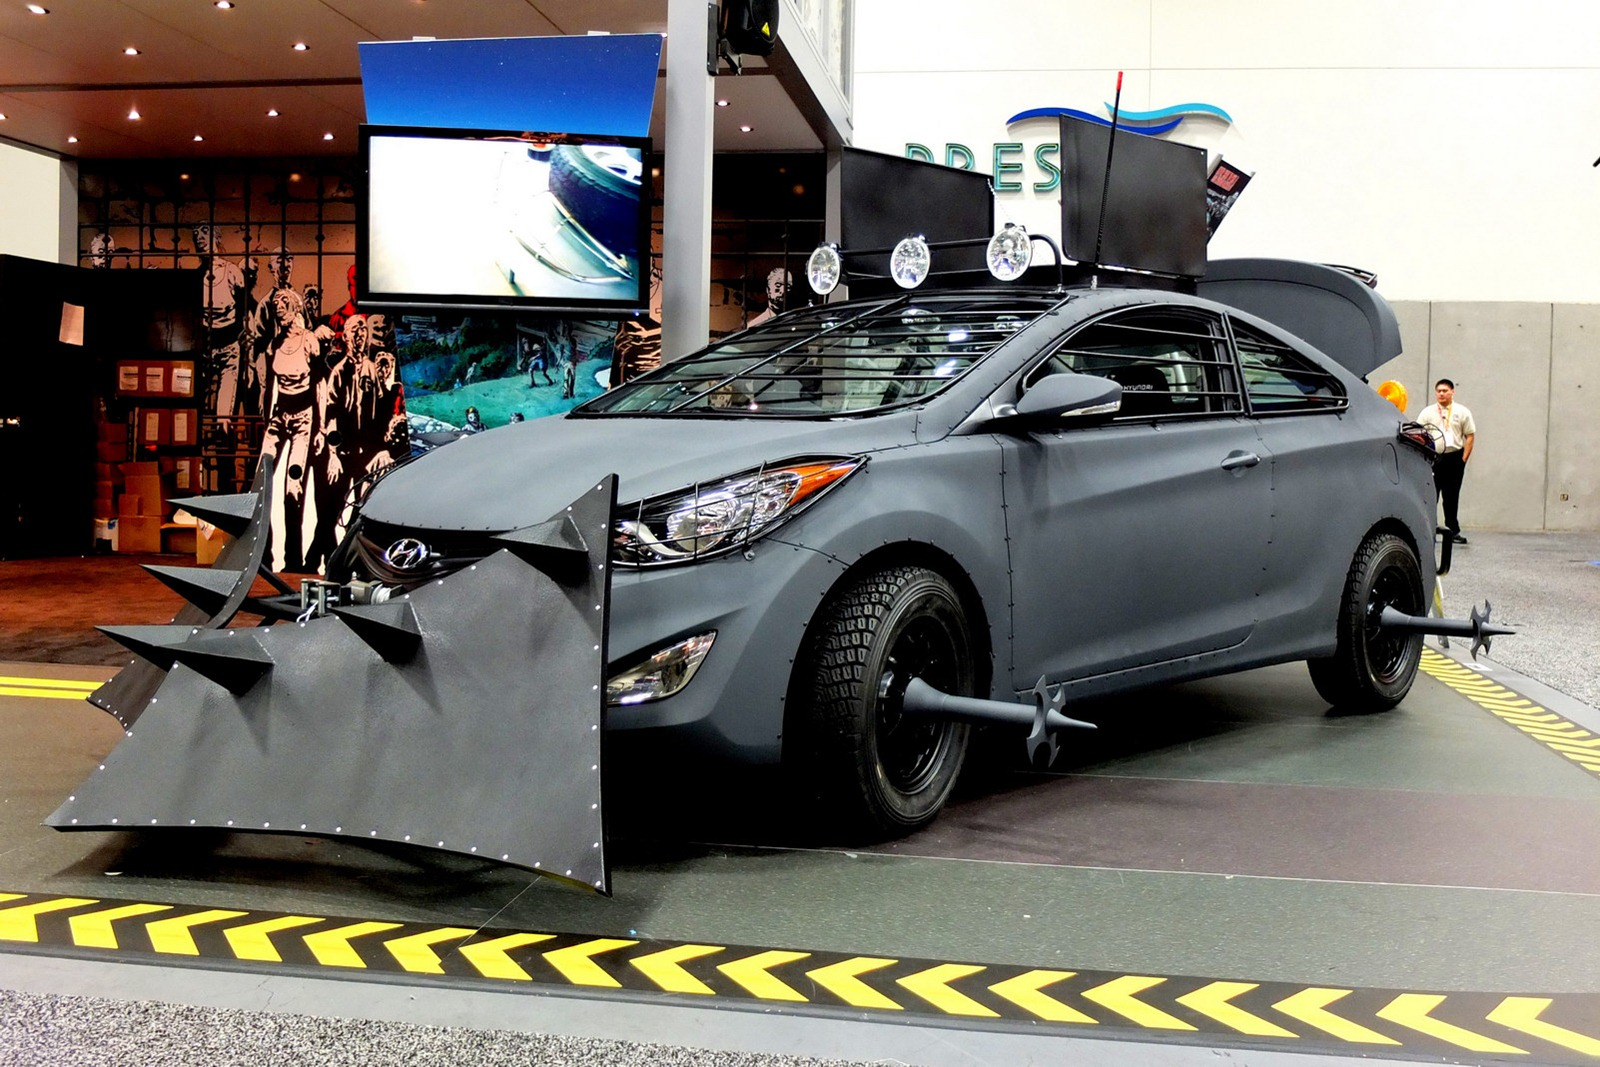 Hyundai_Zombie_Apocalypse_Car